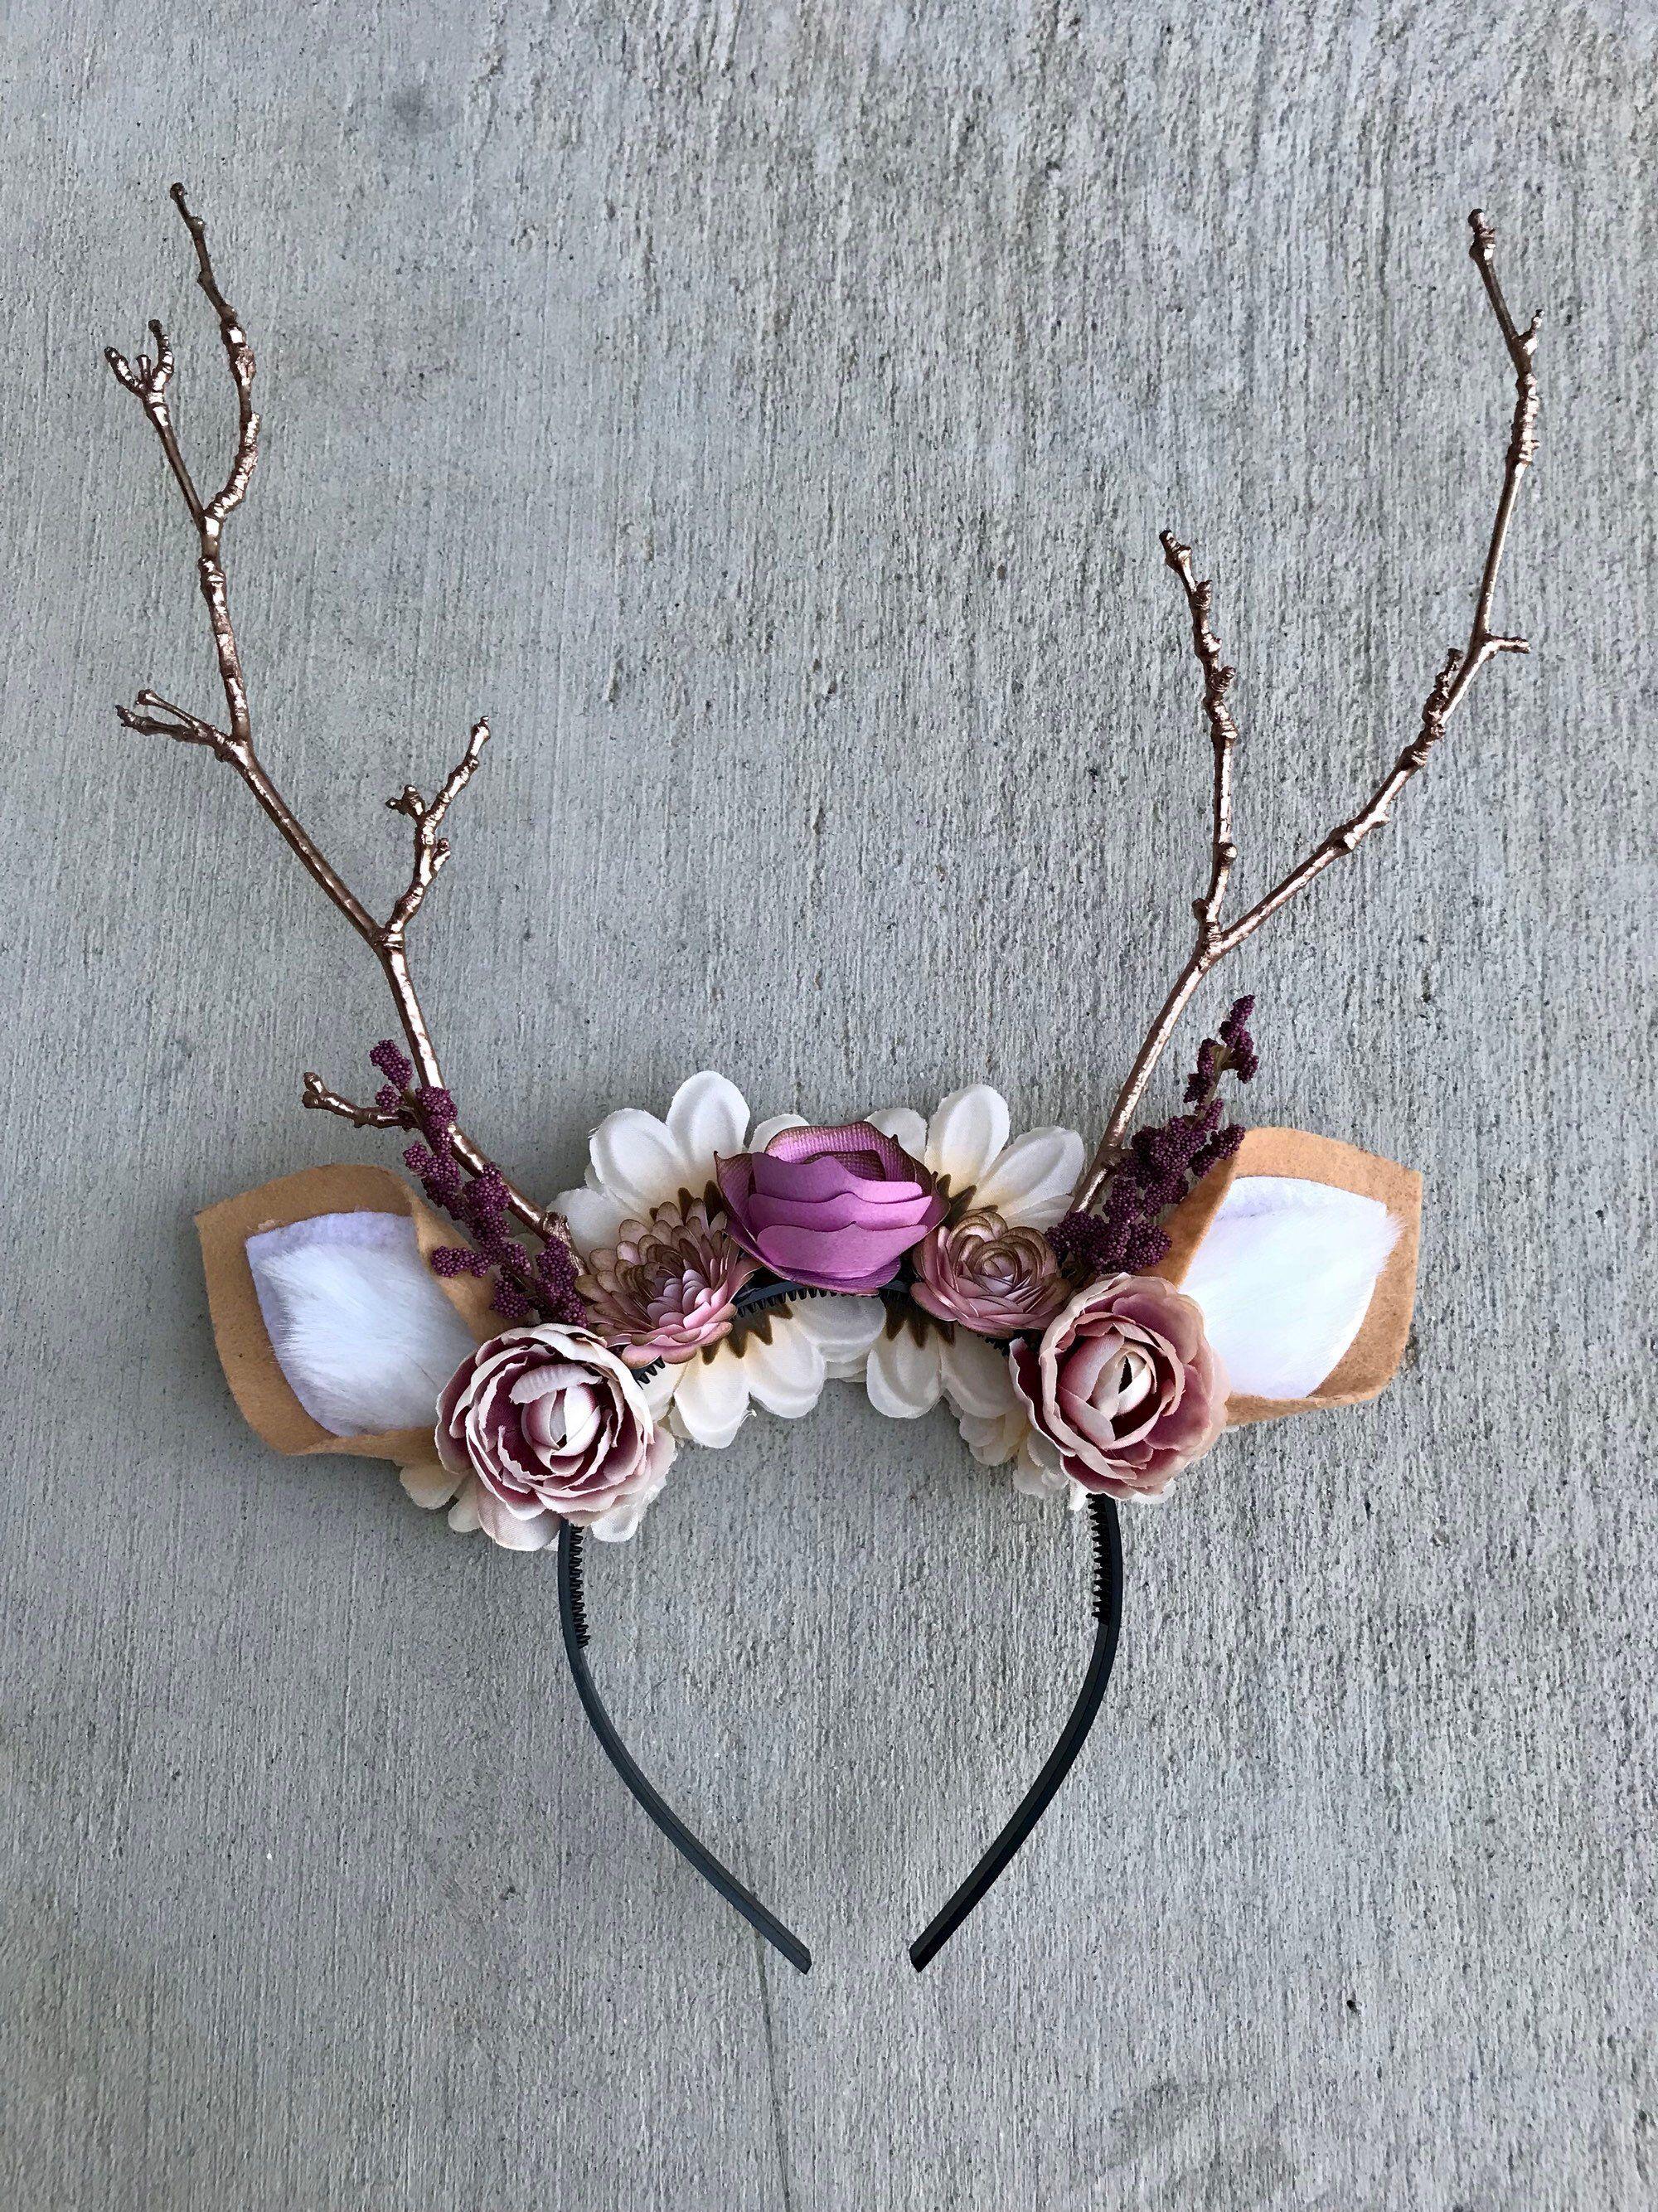 Pin By Kat Lowder On Diy Crafts With Images Deer Headband Deer Costume Halloween Headband